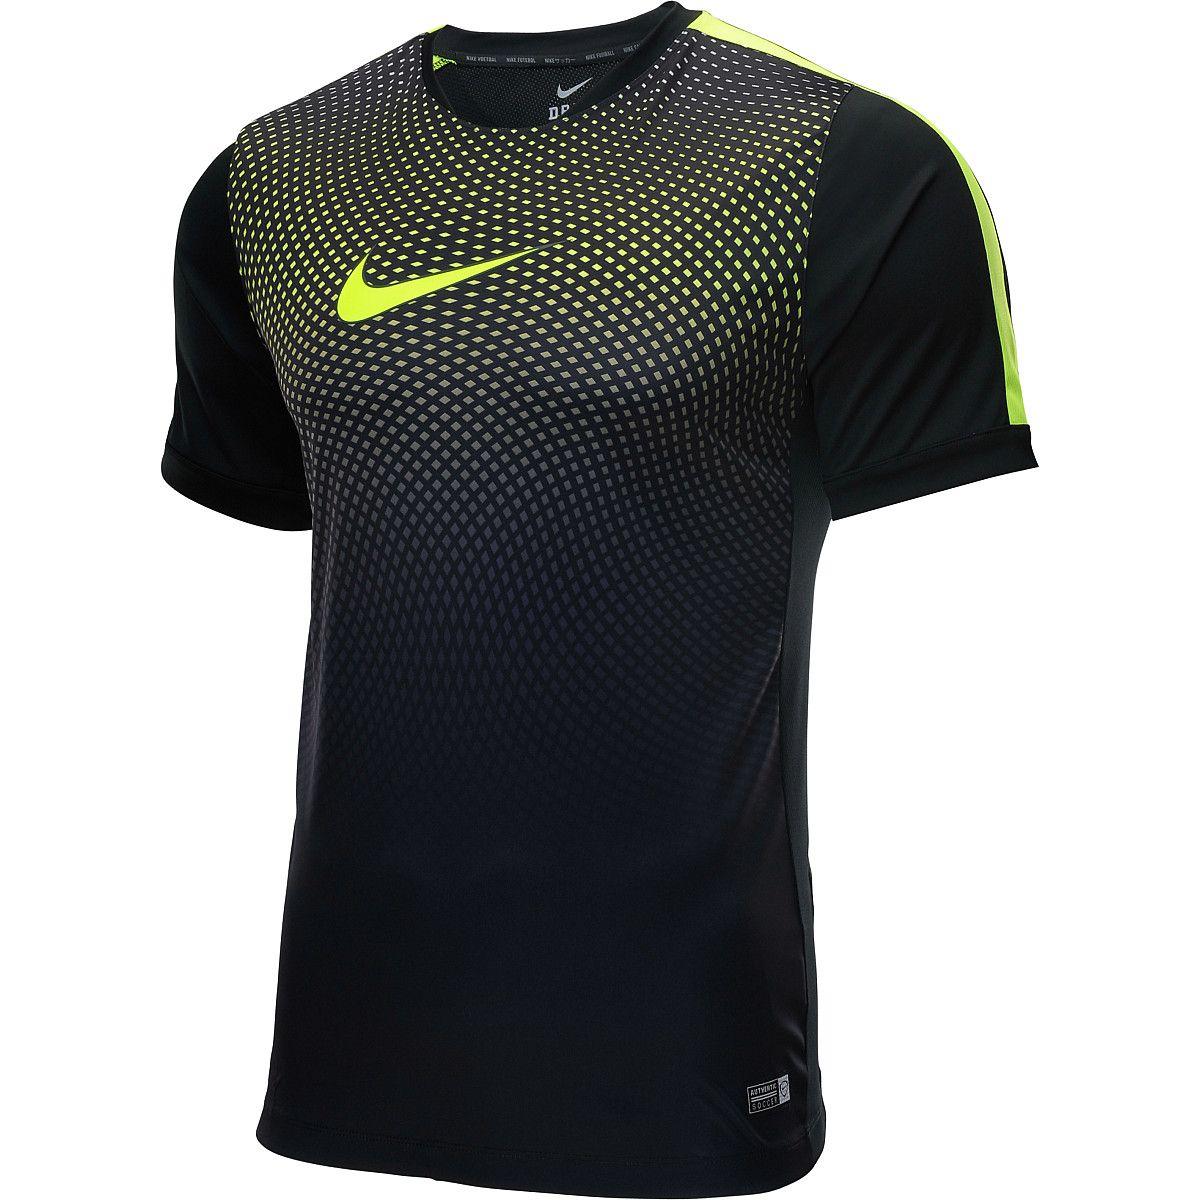 Nike Graphic Flash Top Men s Soccer Shirt  4f4572bc6e7